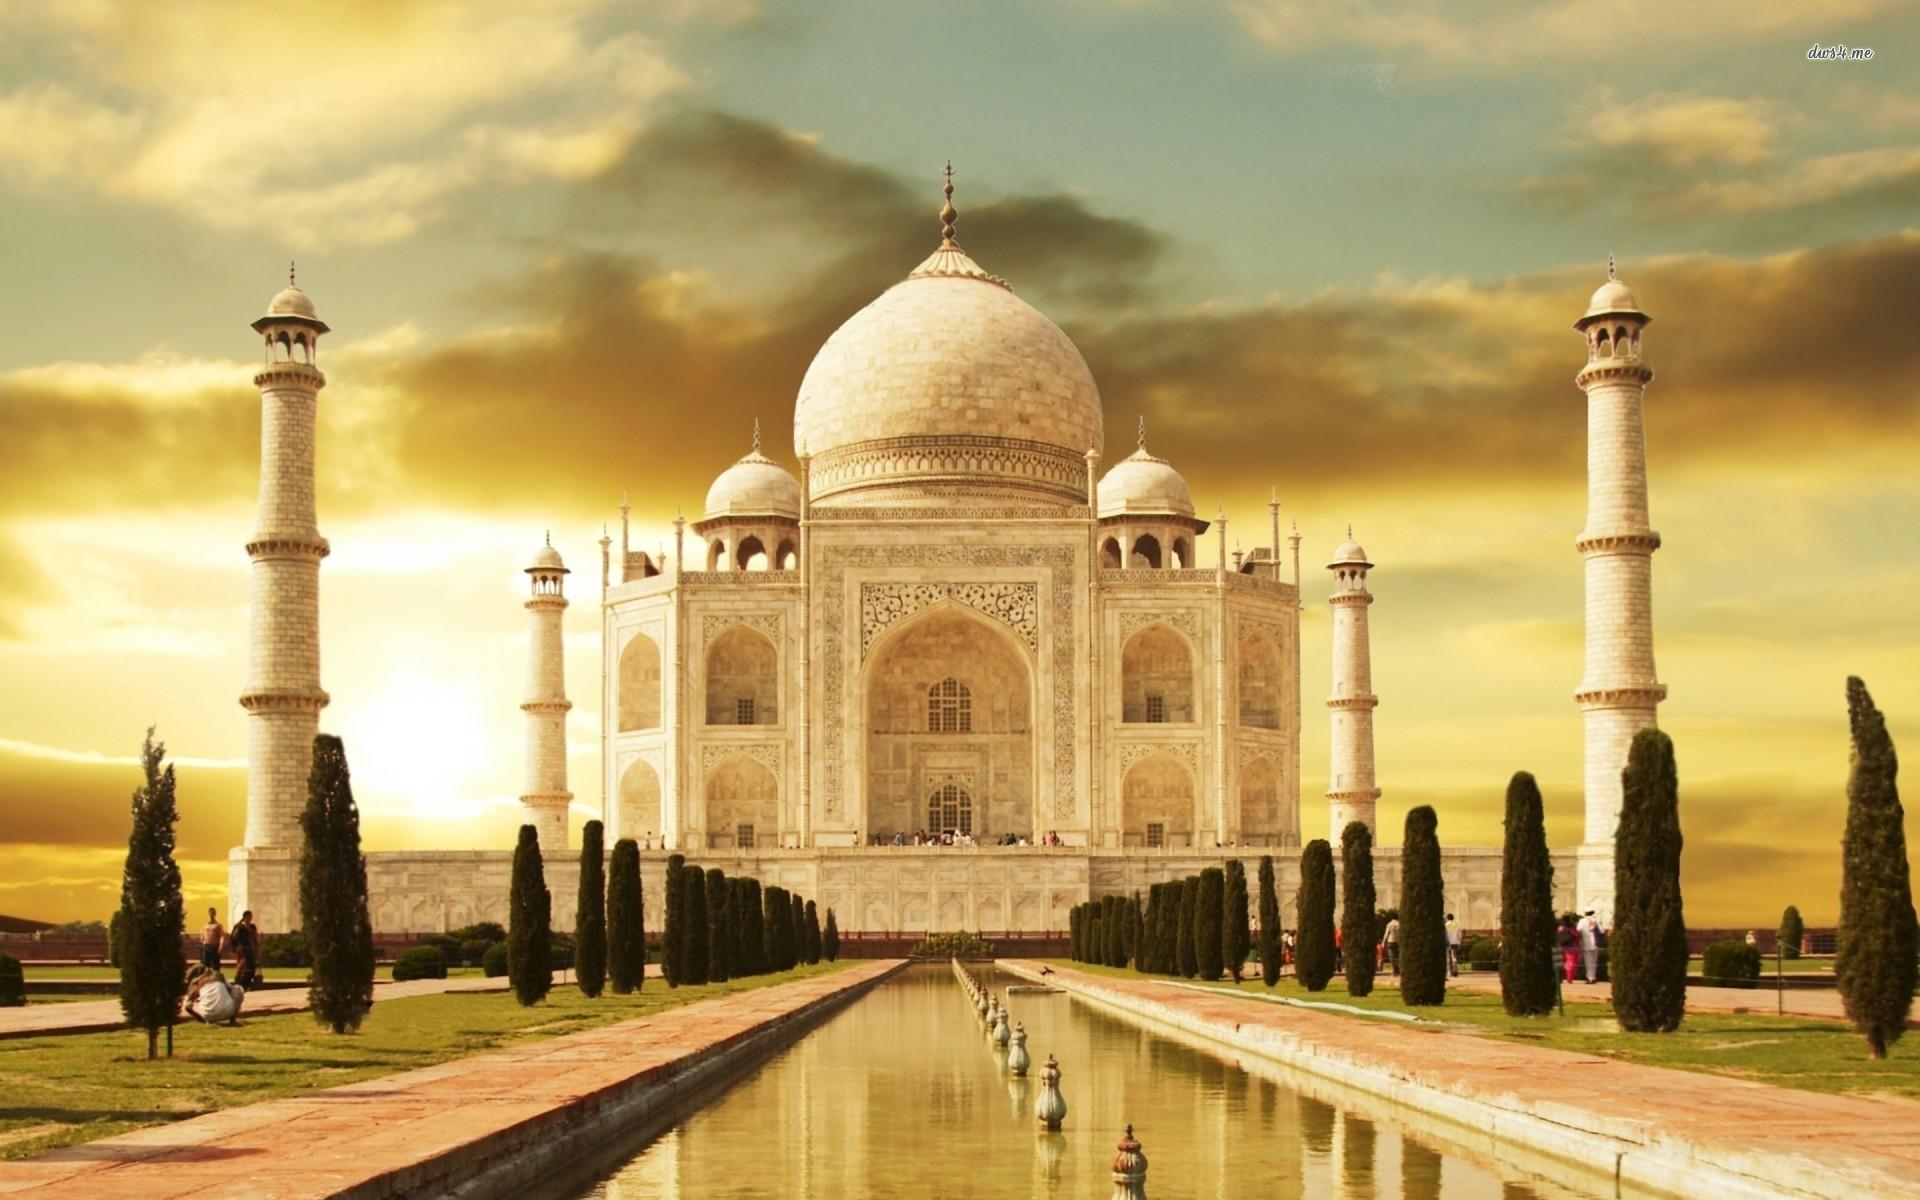 August 2014 markus ray 39 s art look - Taj mahal background hd ...